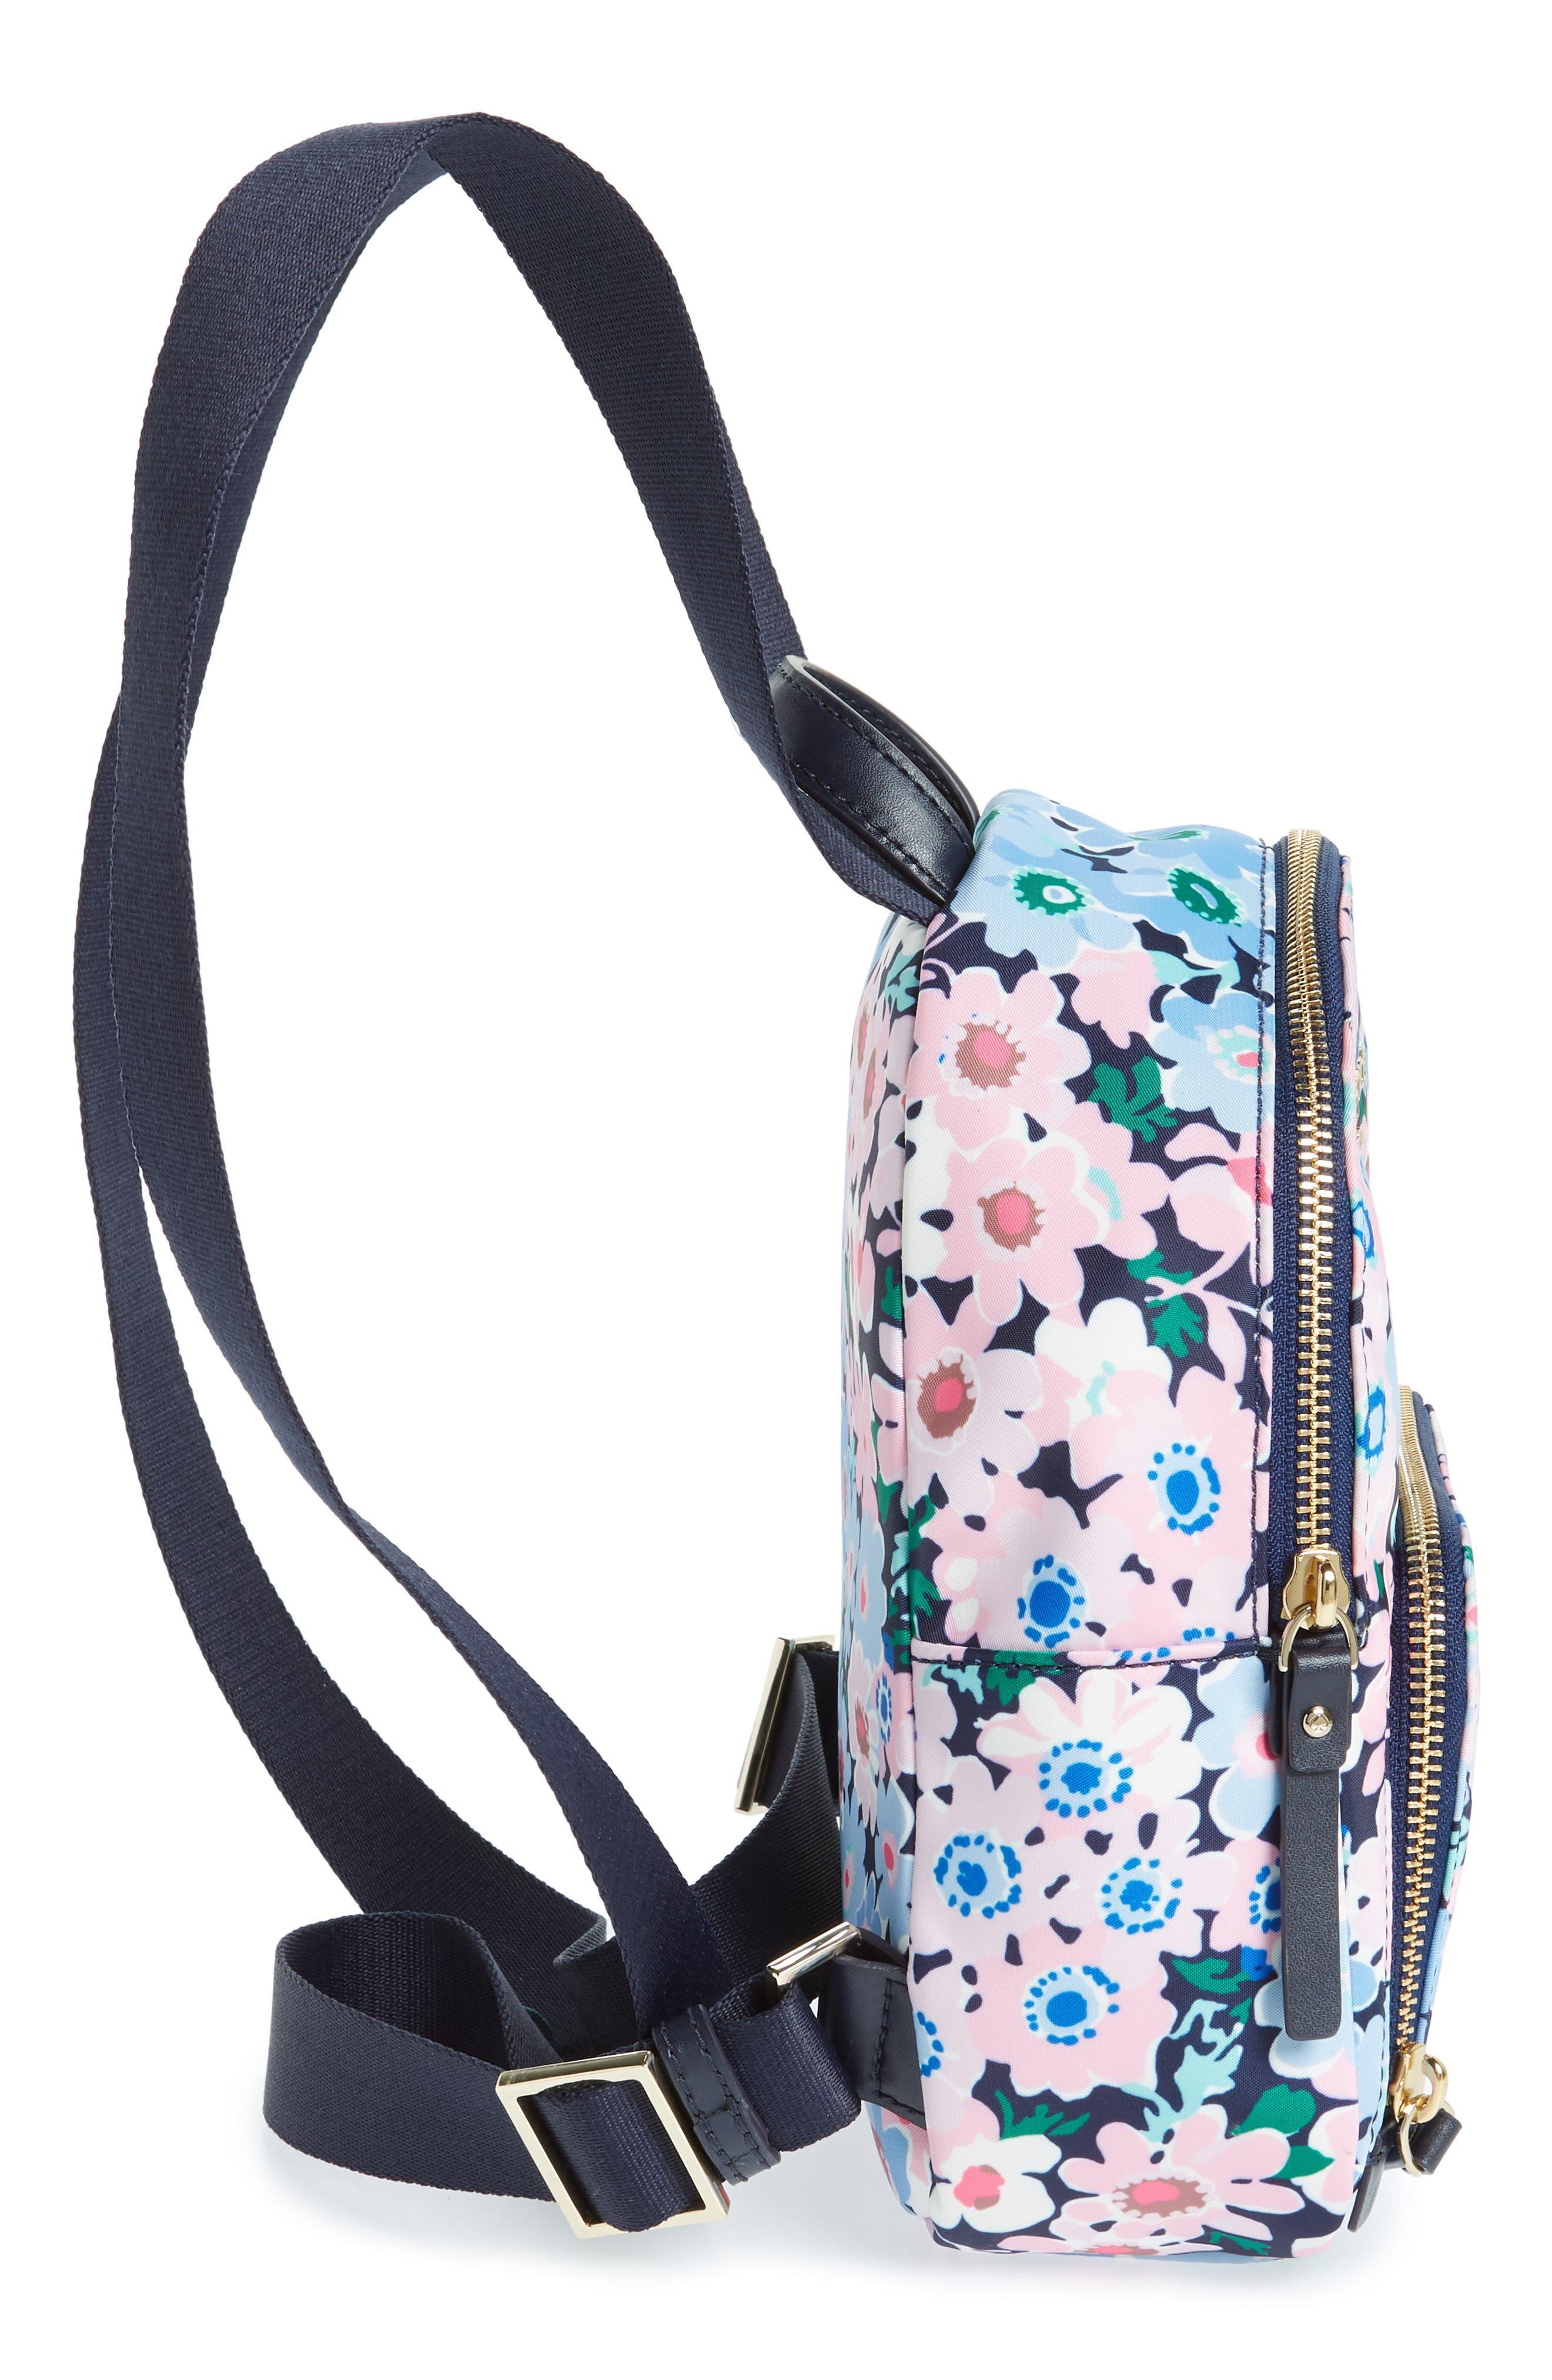 watson lane - daisy garden small hartley backpack,                             Alternate thumbnail 5, color,                             Blue Multi